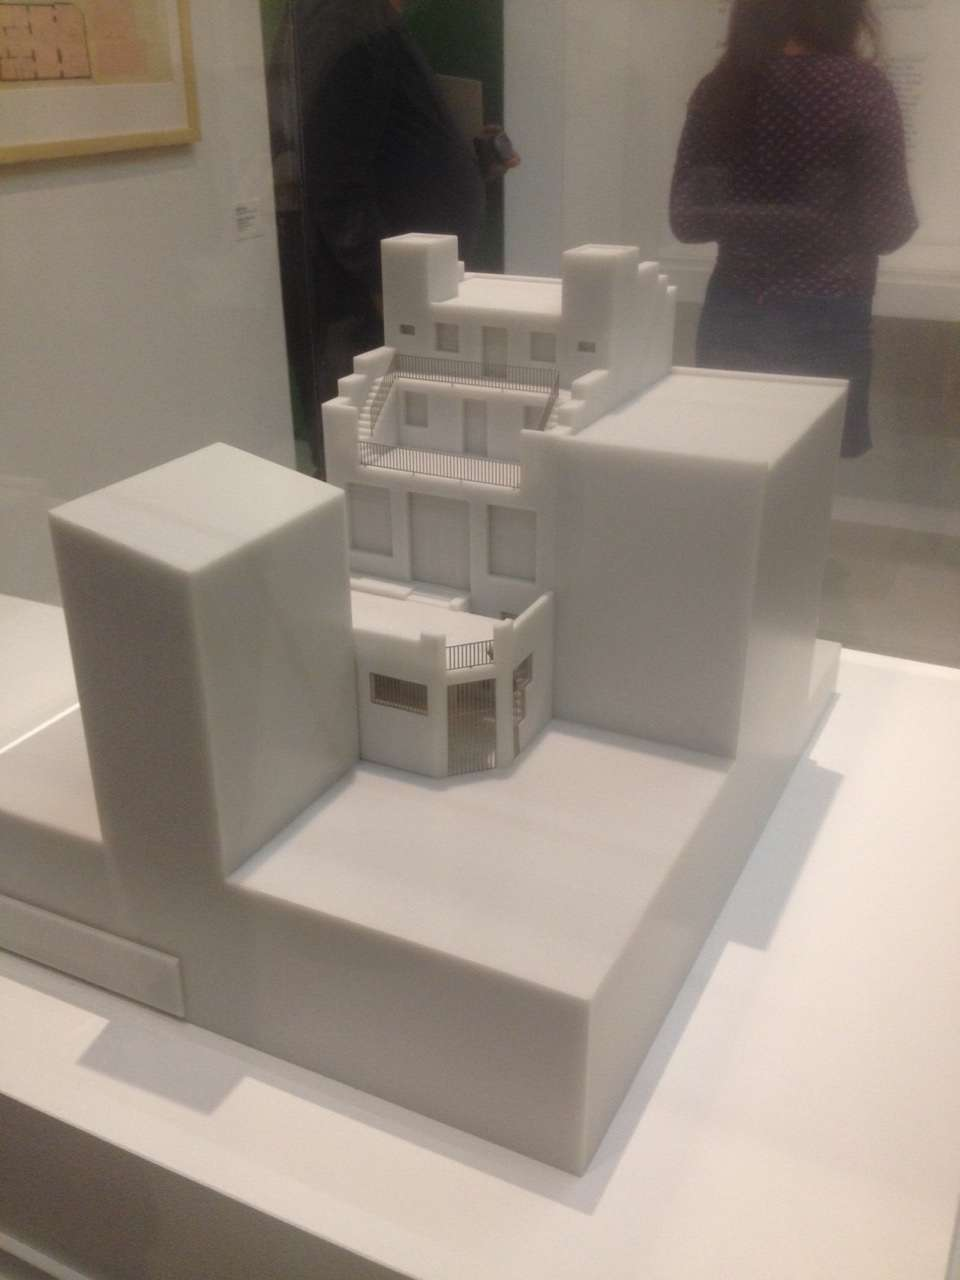 Macheta vilei lui Tristan Tzara din Montmartre desenatà arhitectul vienez Adolf Loos